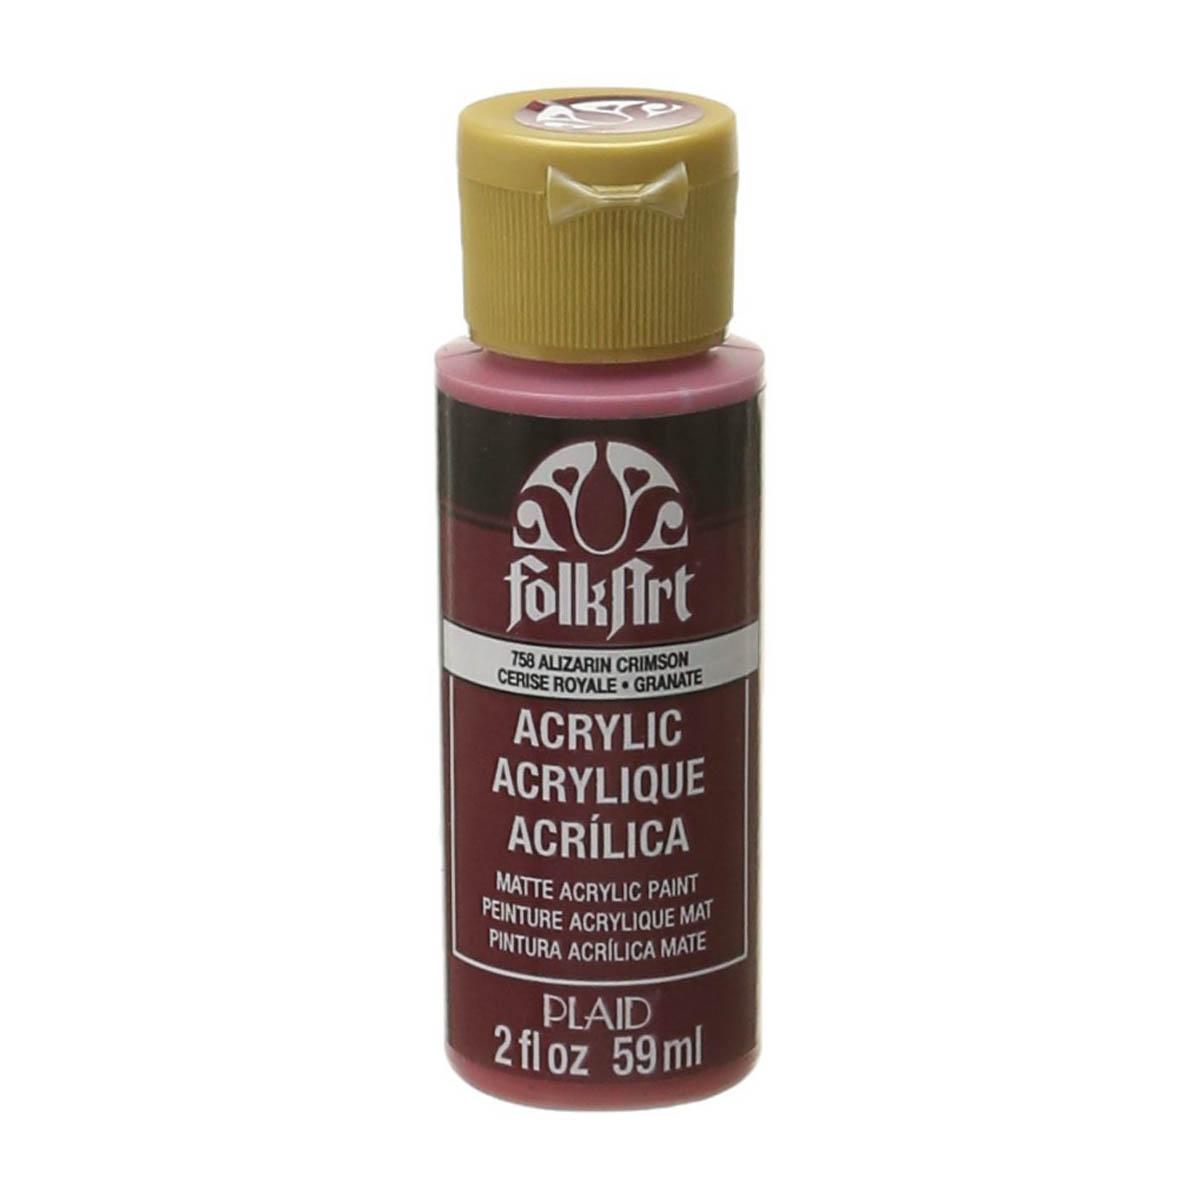 FolkArt ® Acrylic Colors - Alizarin Crimson, 2 oz.